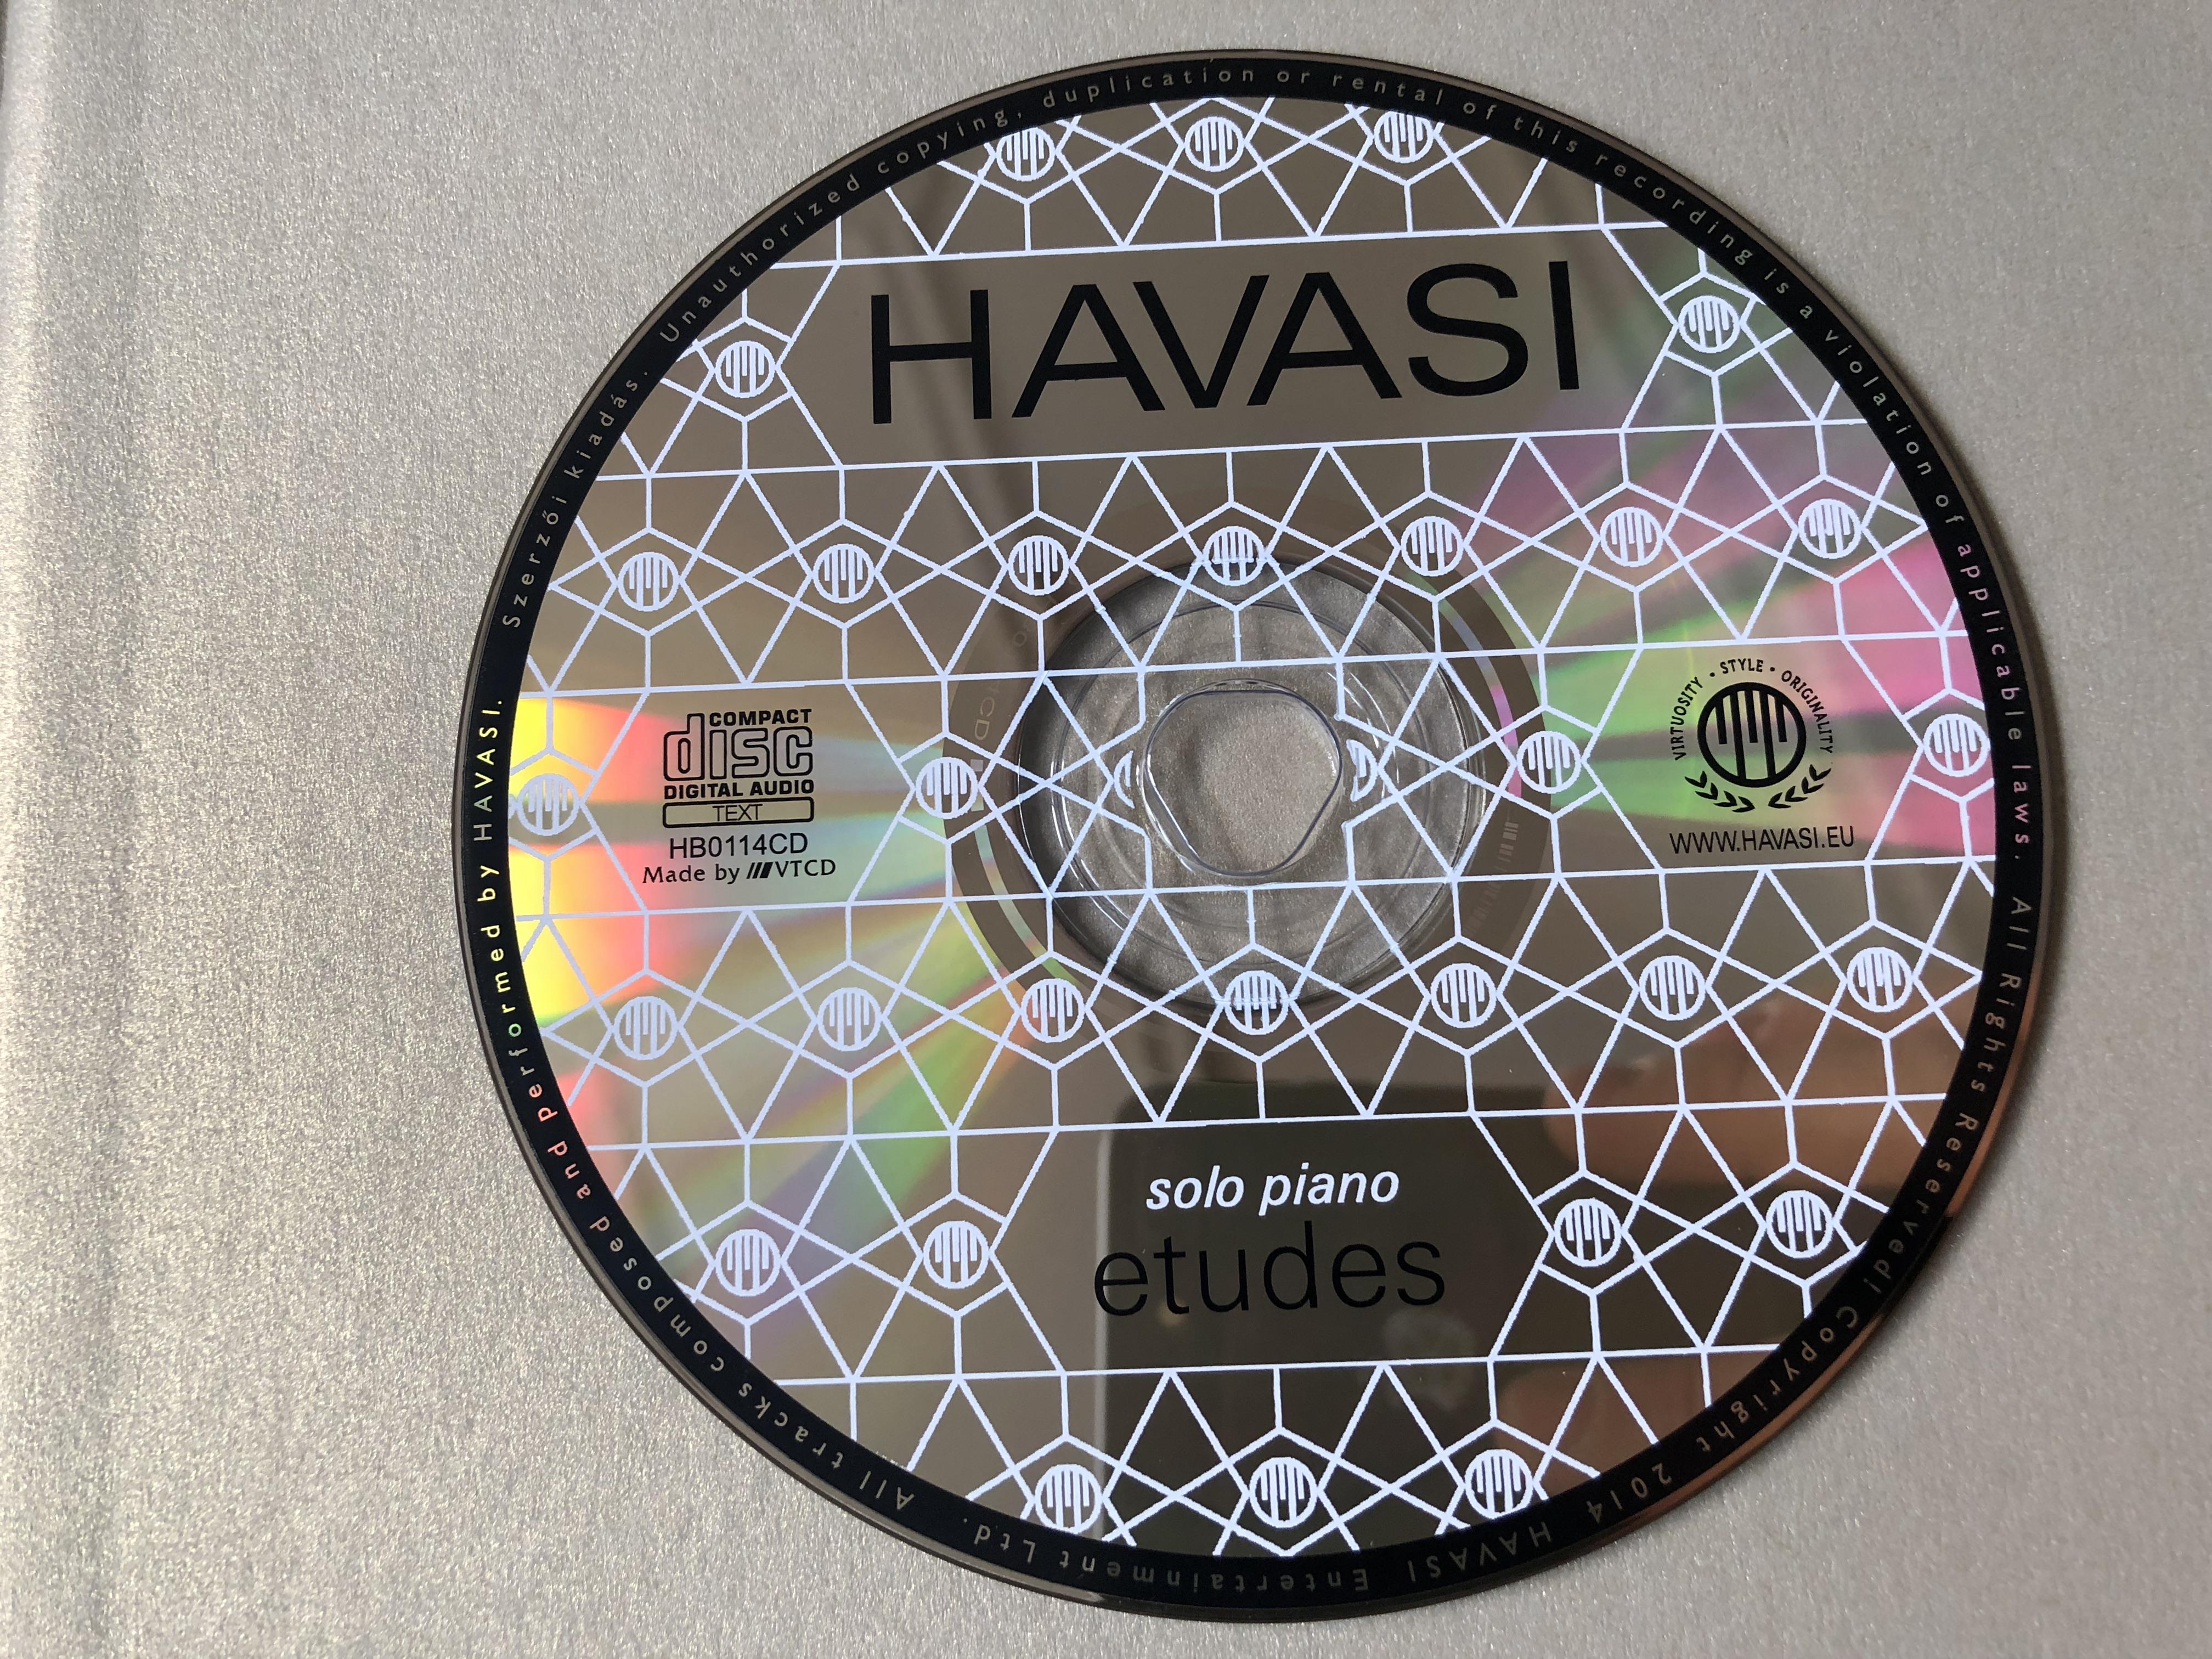 havasi-bal-zs-etudes-1-13-cd-in-piano-sheet-music-book-8-.jpg